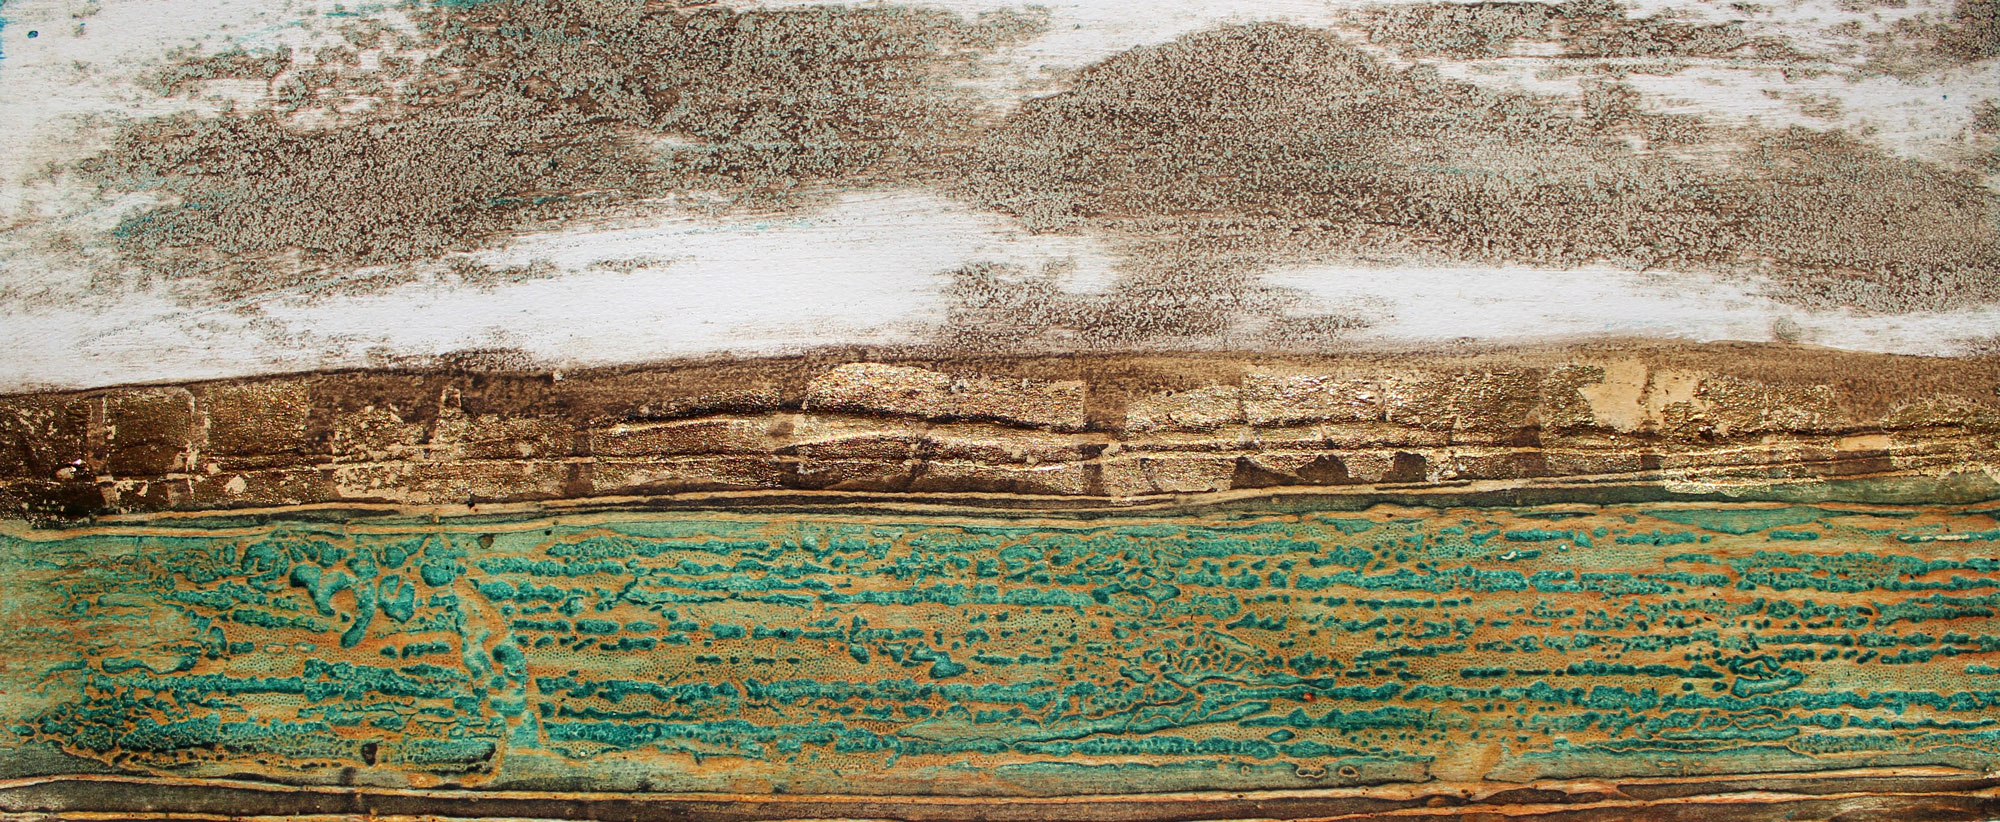 Golden Horizons   collagraph    22 x 52 cm    £220